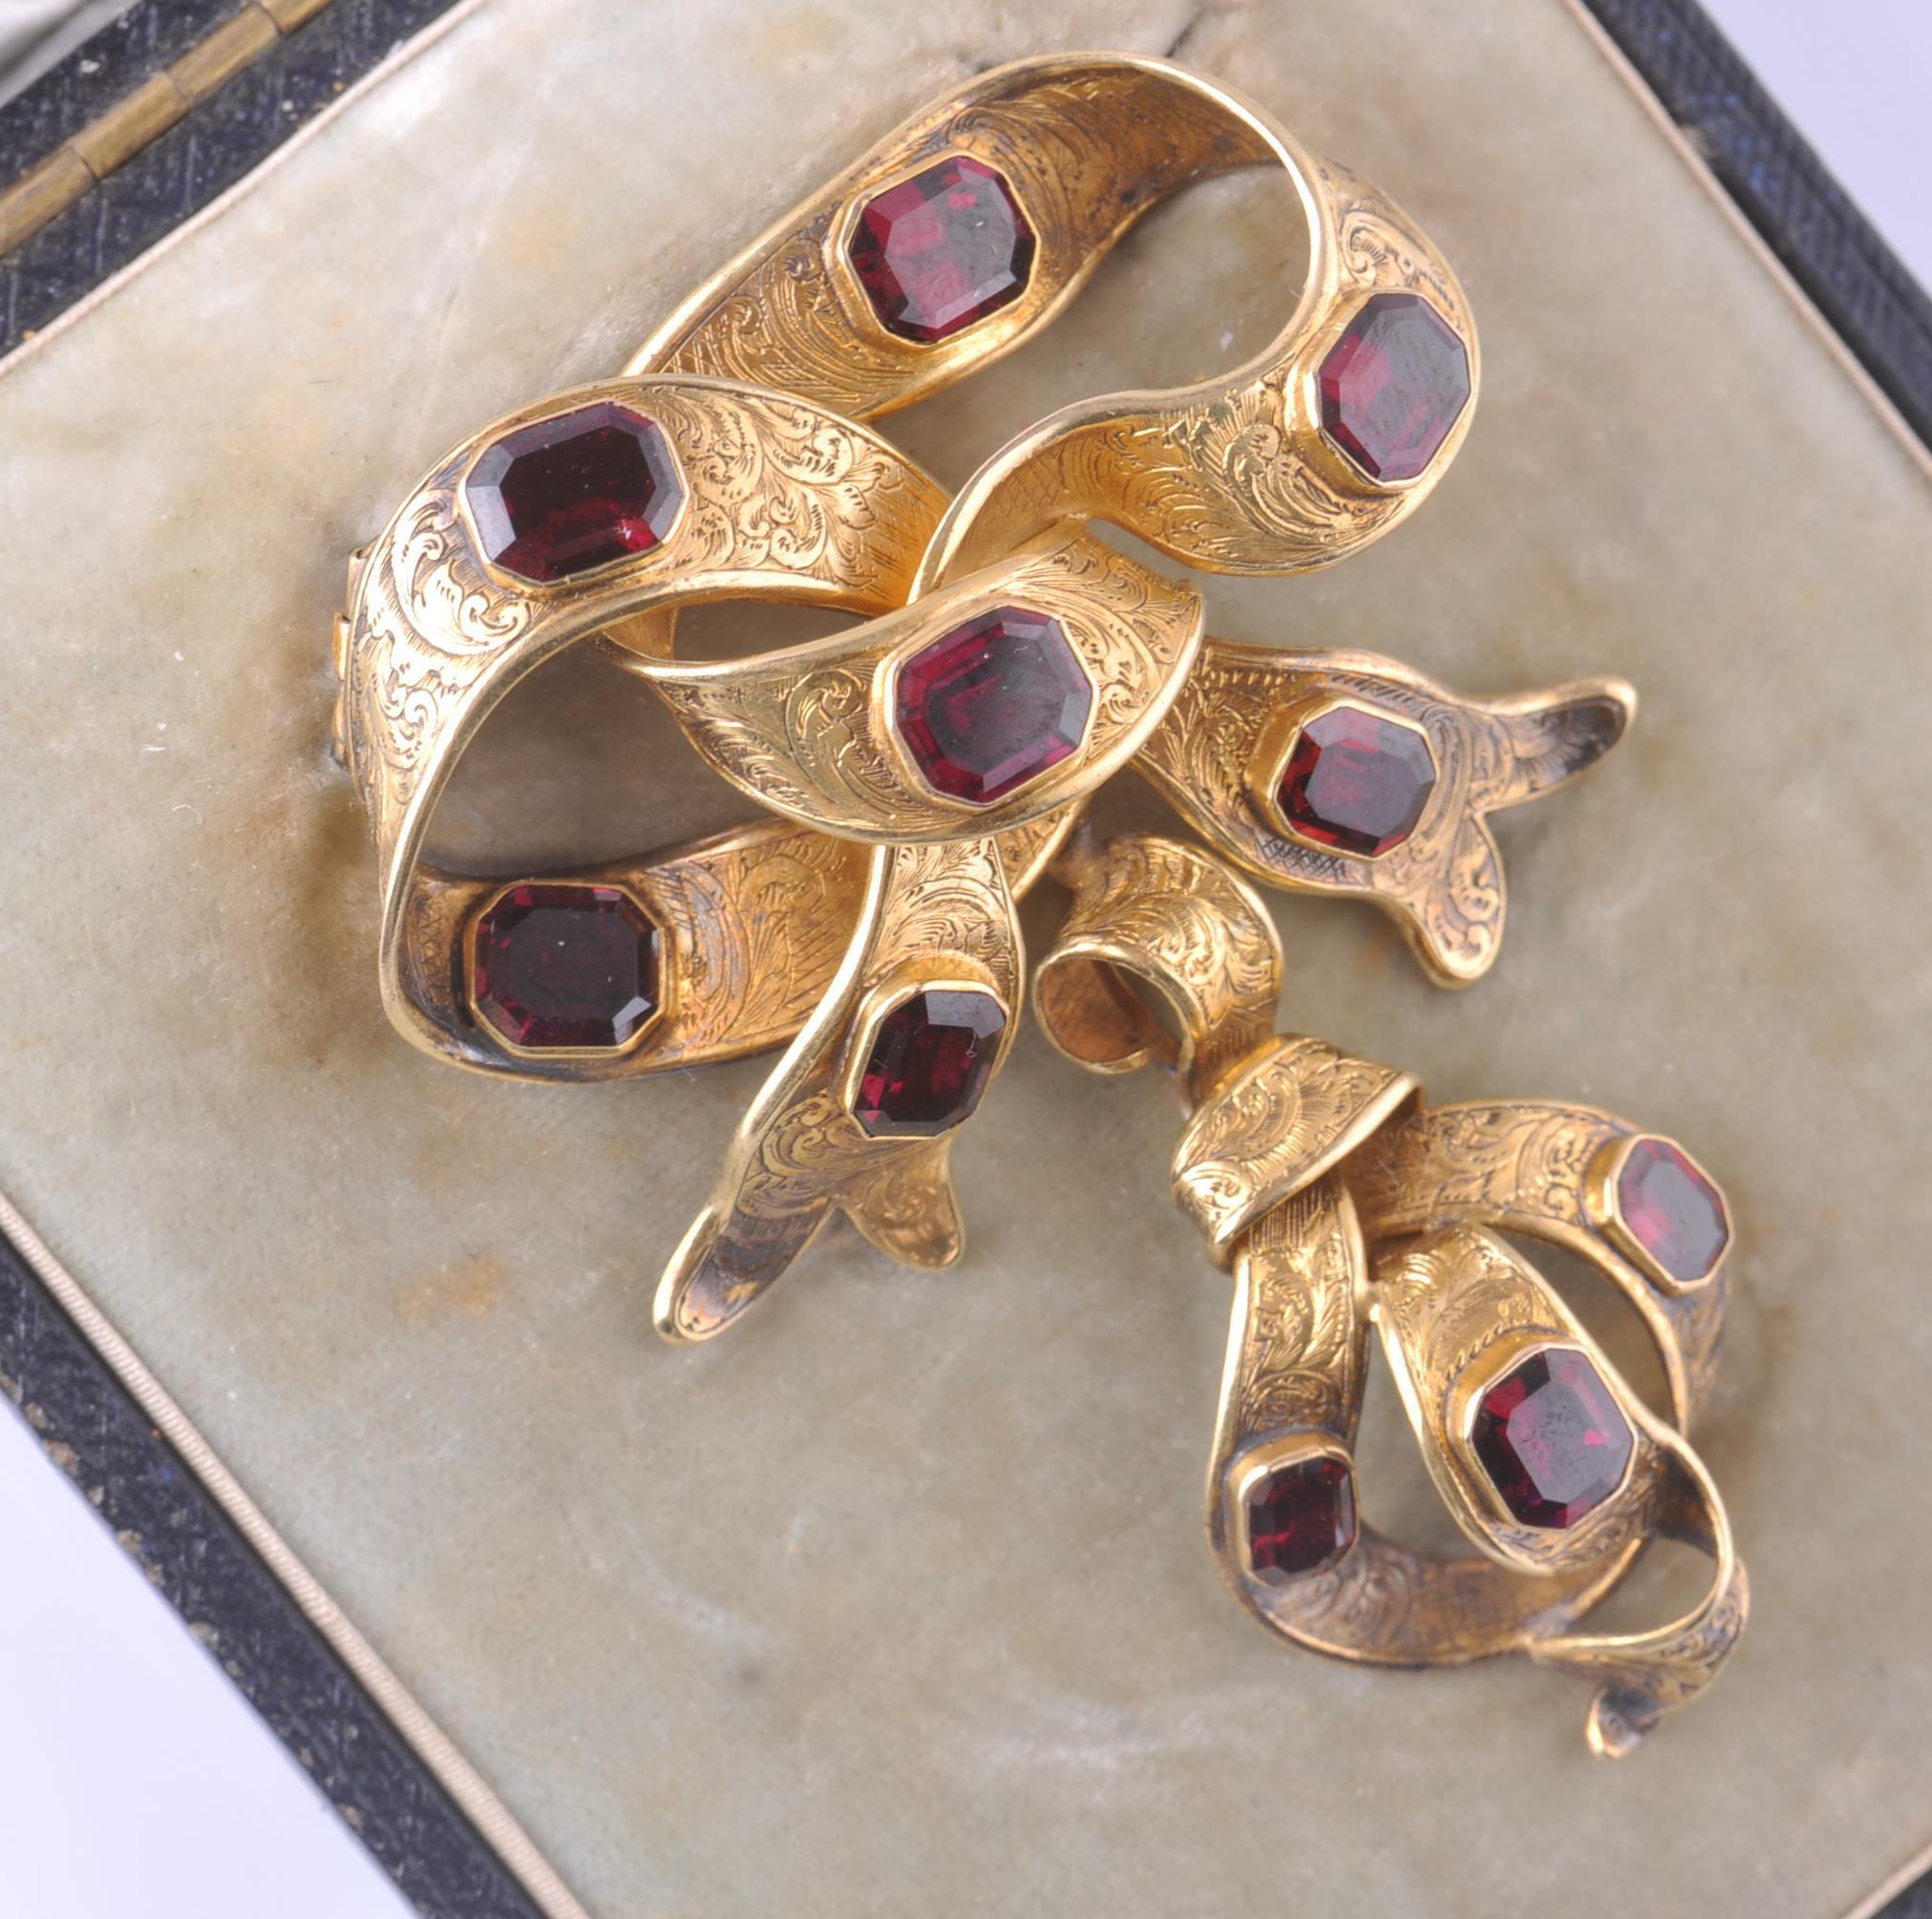 A CASED 19TH CENTURY GOLD & GARNET BROOCH